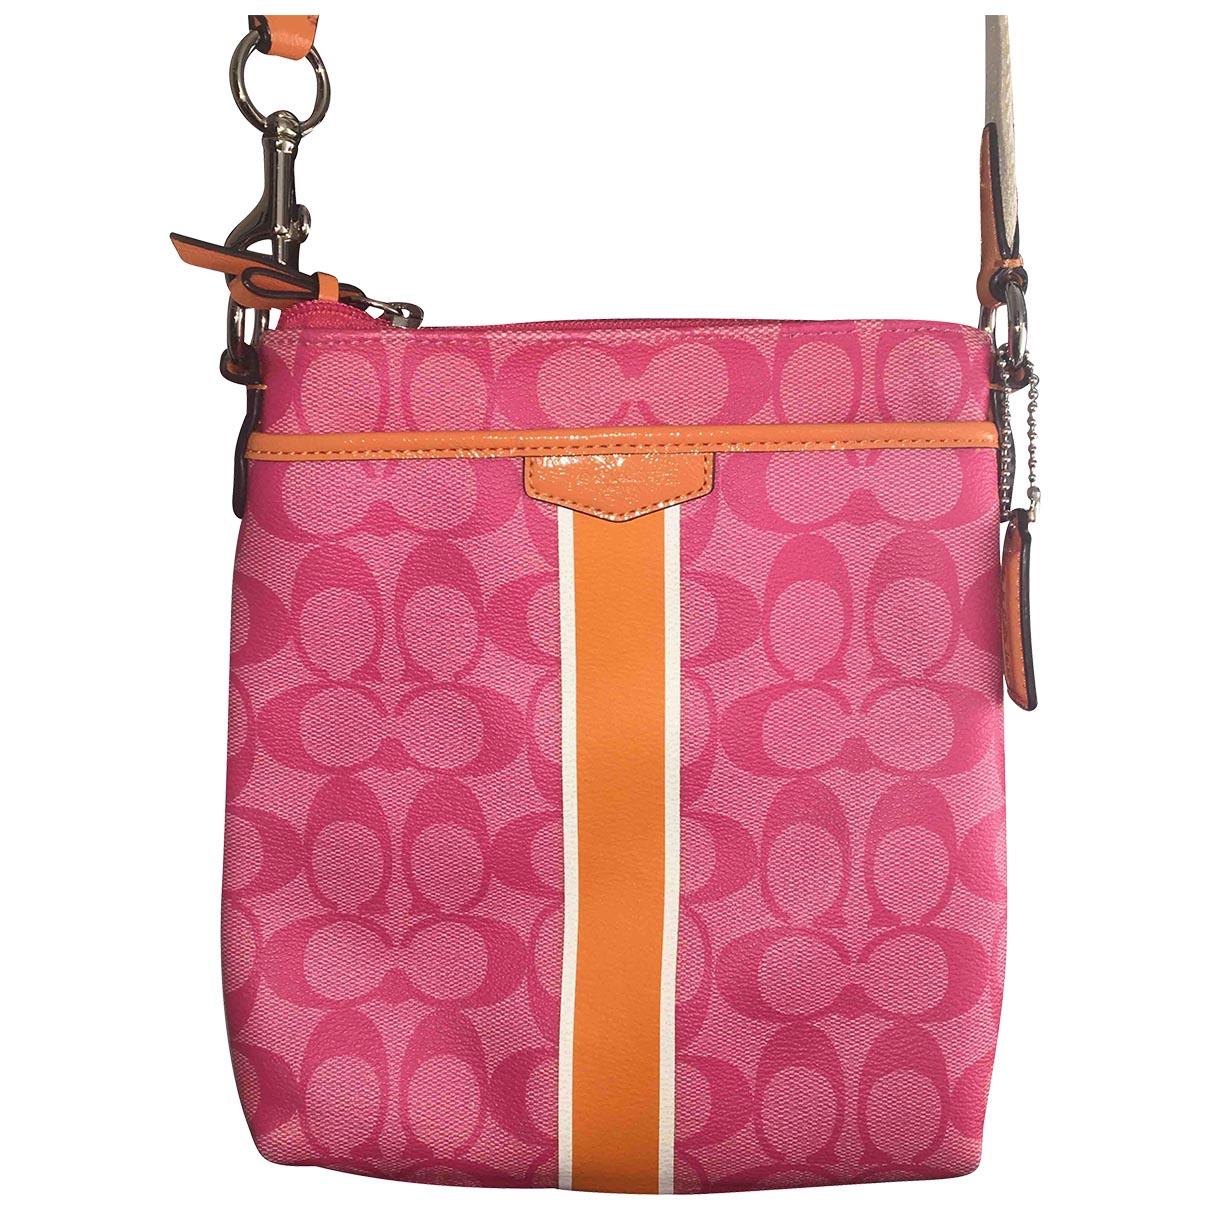 Coach \N Pink Cloth handbag for Women \N